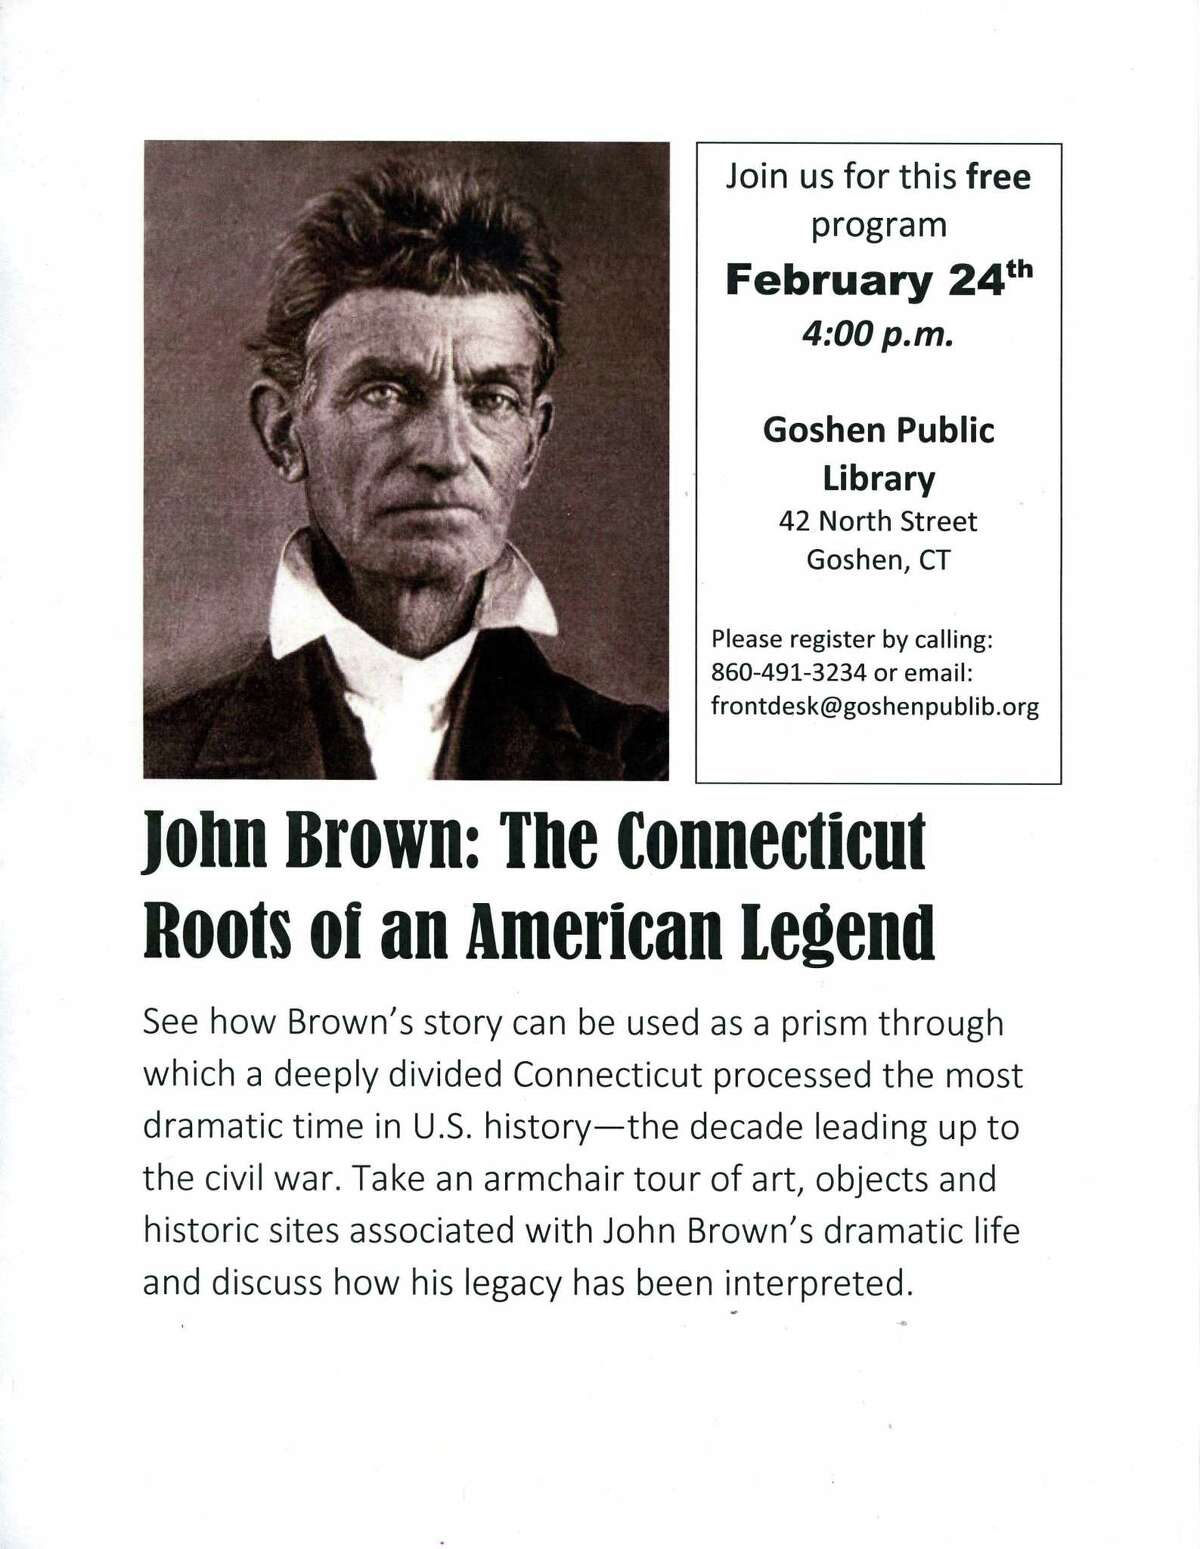 The Goshen Public Library will host a program on John Brown Feb. 24.